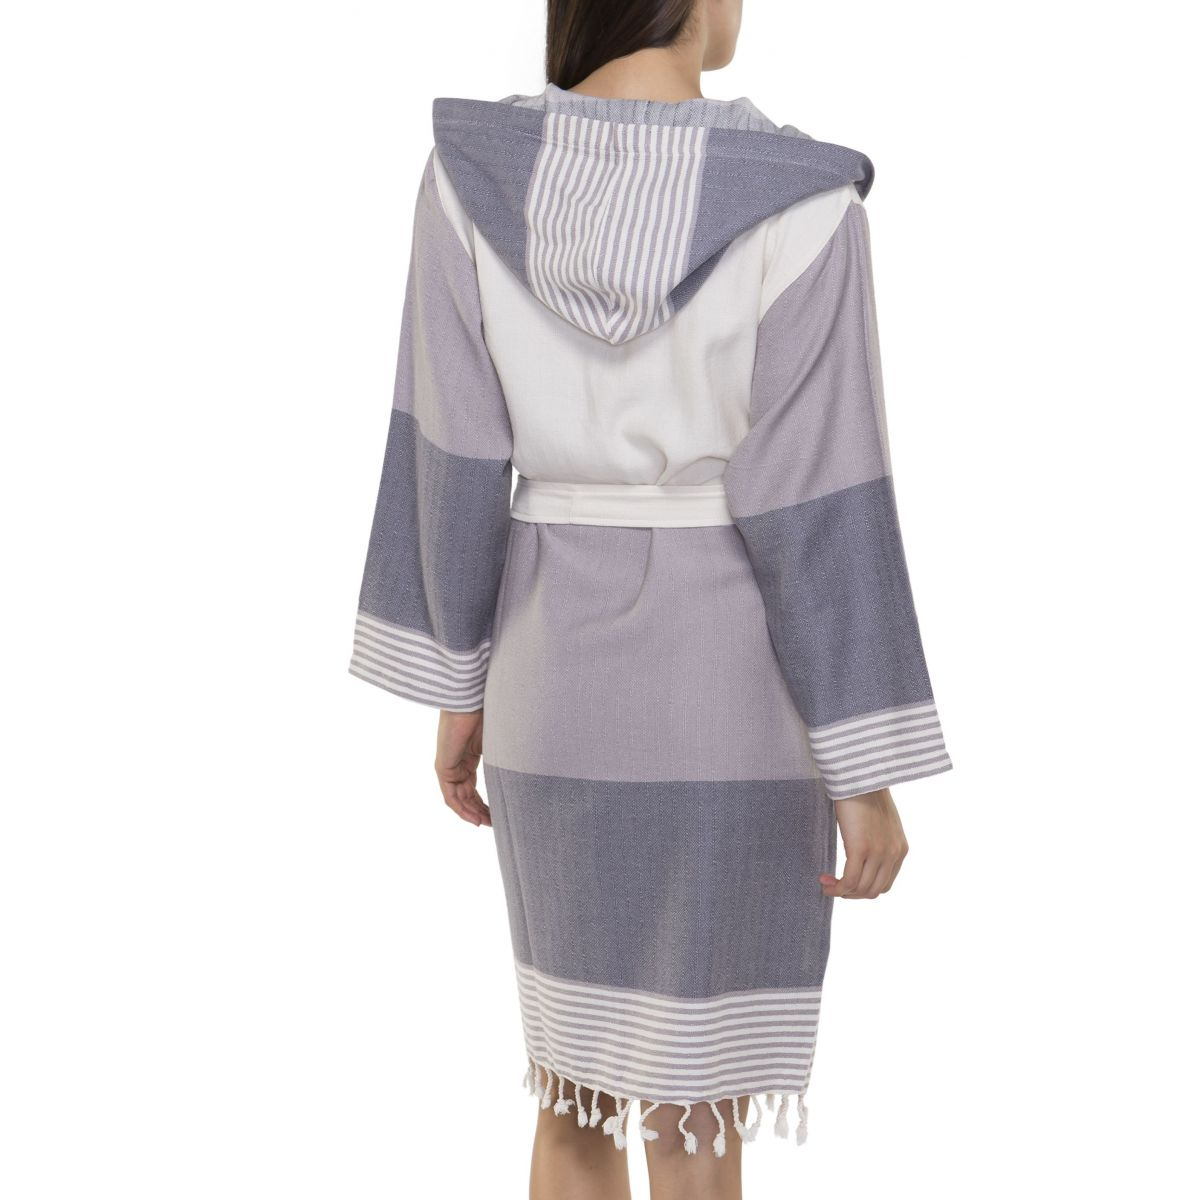 Bathrobe Twin Sultan with hood - Light Grey - Dark Grey